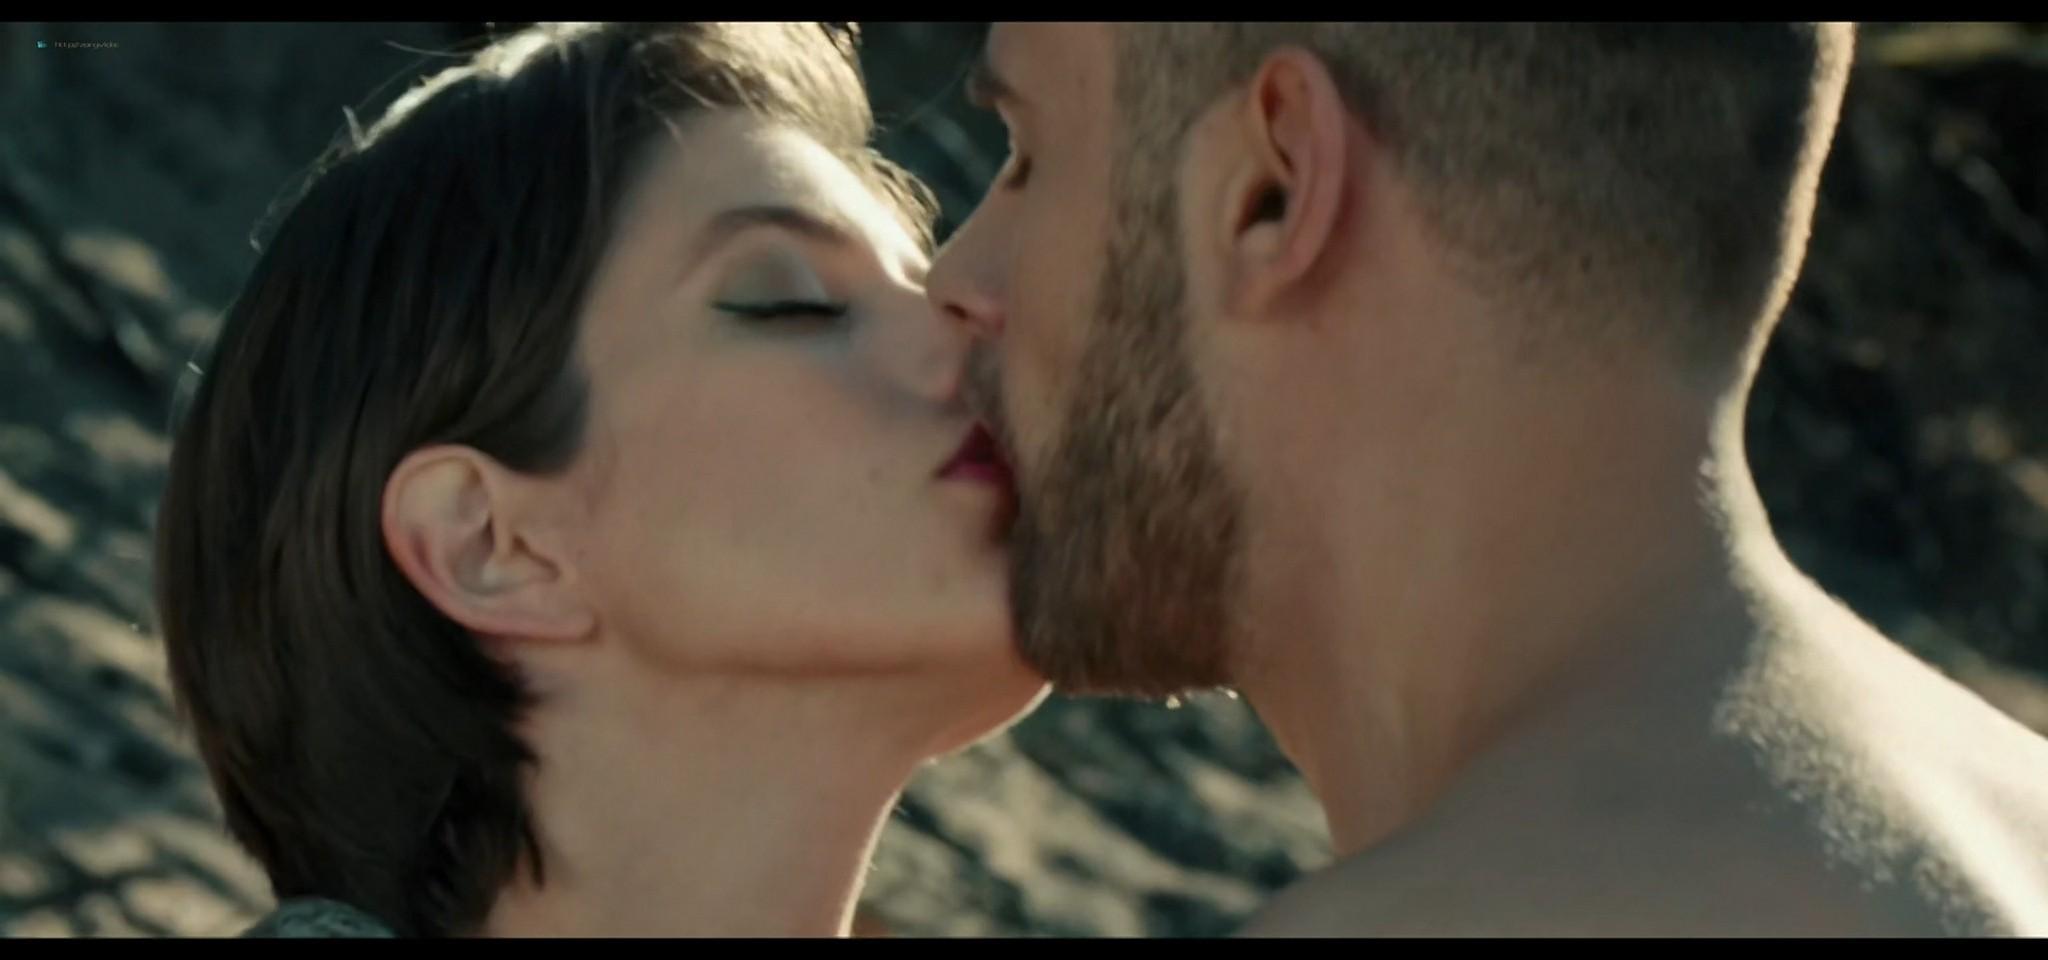 Yulia Snigir hot and some sex Anna Chipovskaya, Yuliya Peresild sexy - The End of the Season (2019) HD 1080p Web (5)